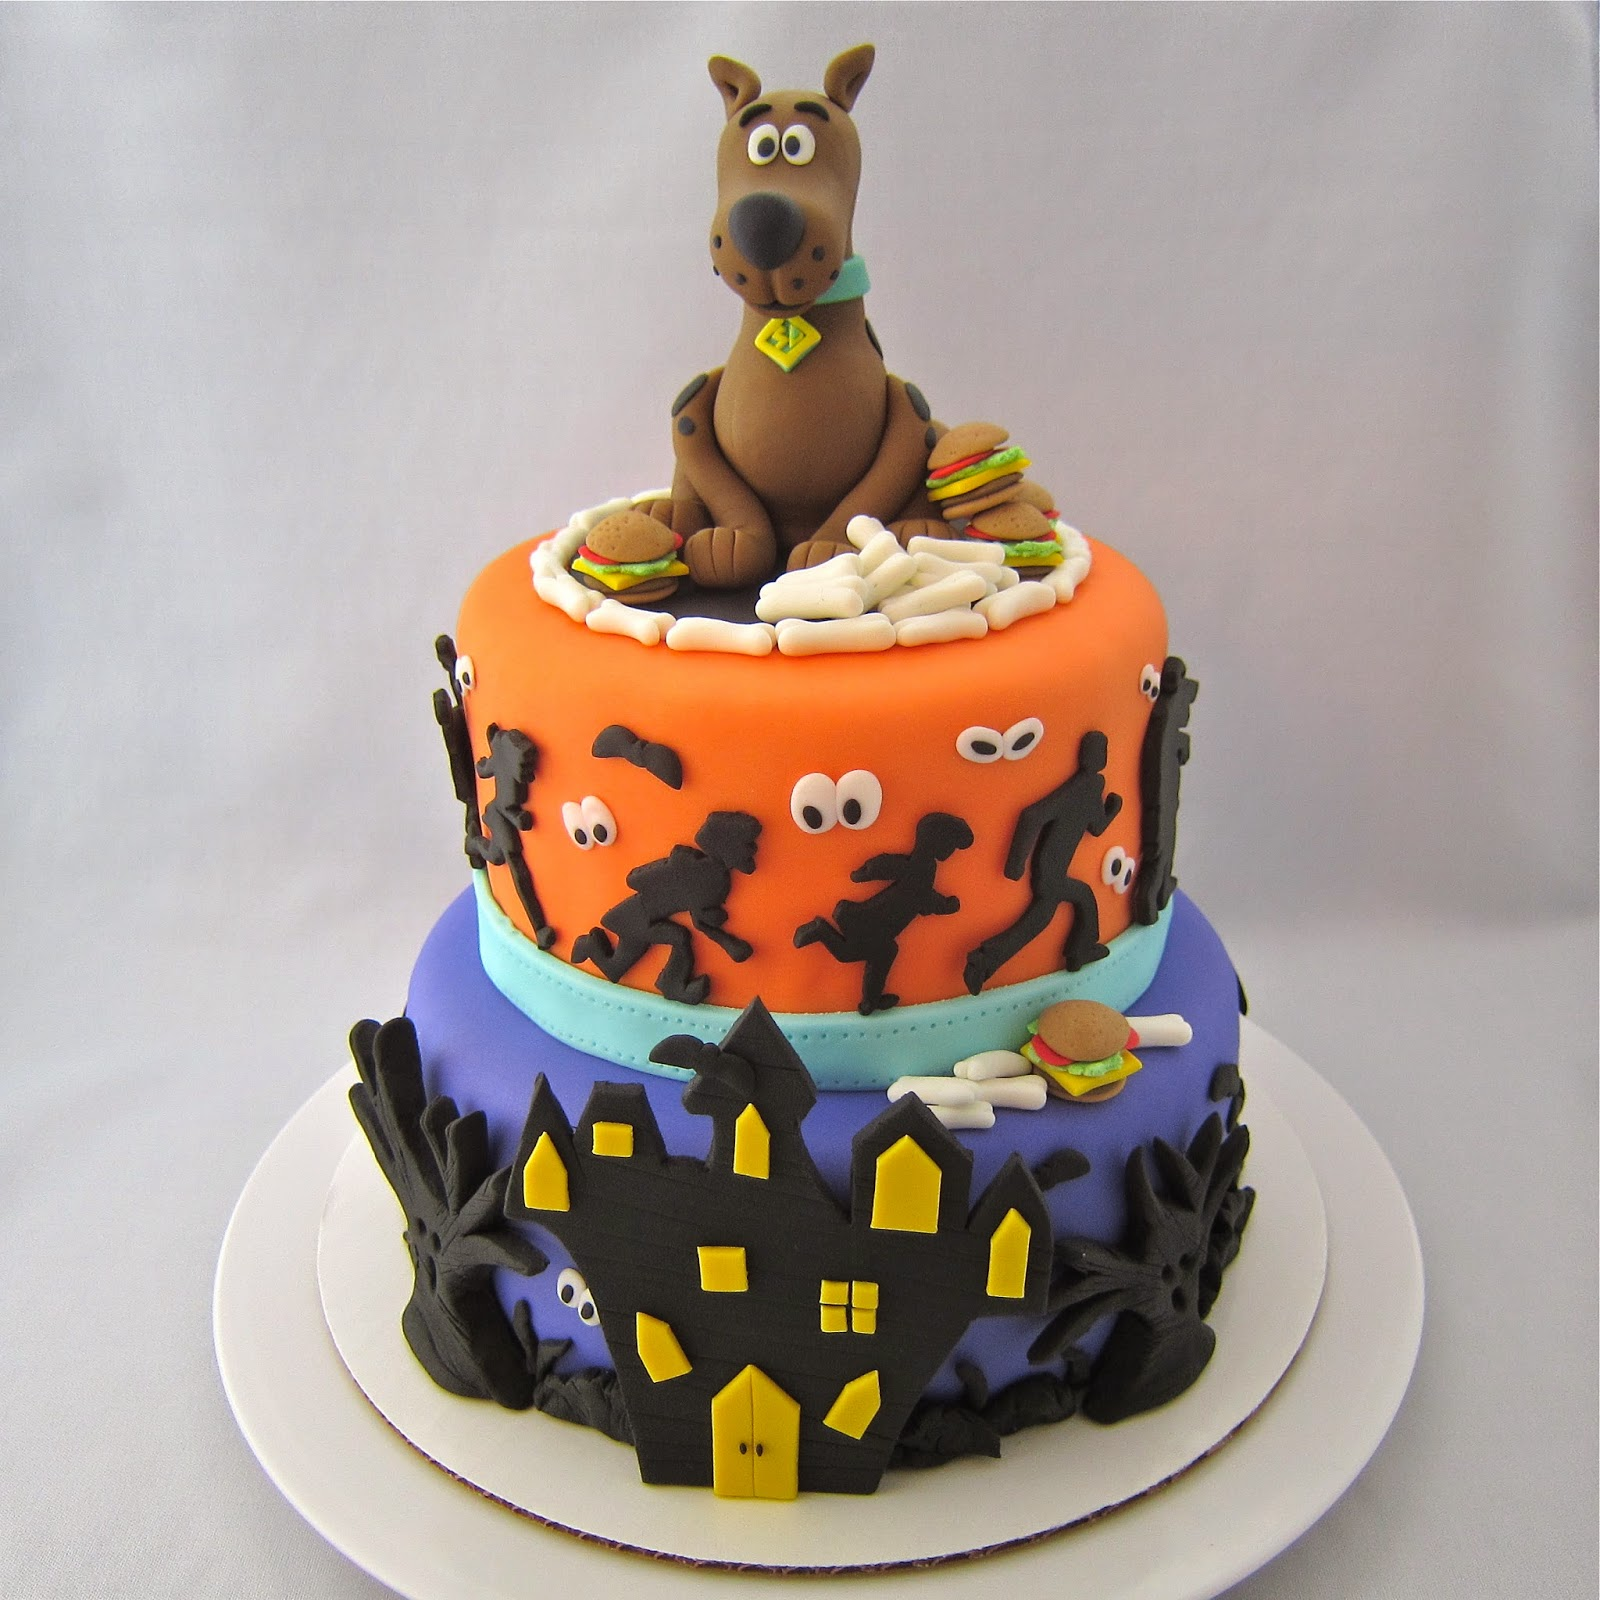 Stupendous 10 Scoody Doo Cakes Photo Scooby Doo Cake Scooby Doo Birthday Funny Birthday Cards Online Alyptdamsfinfo